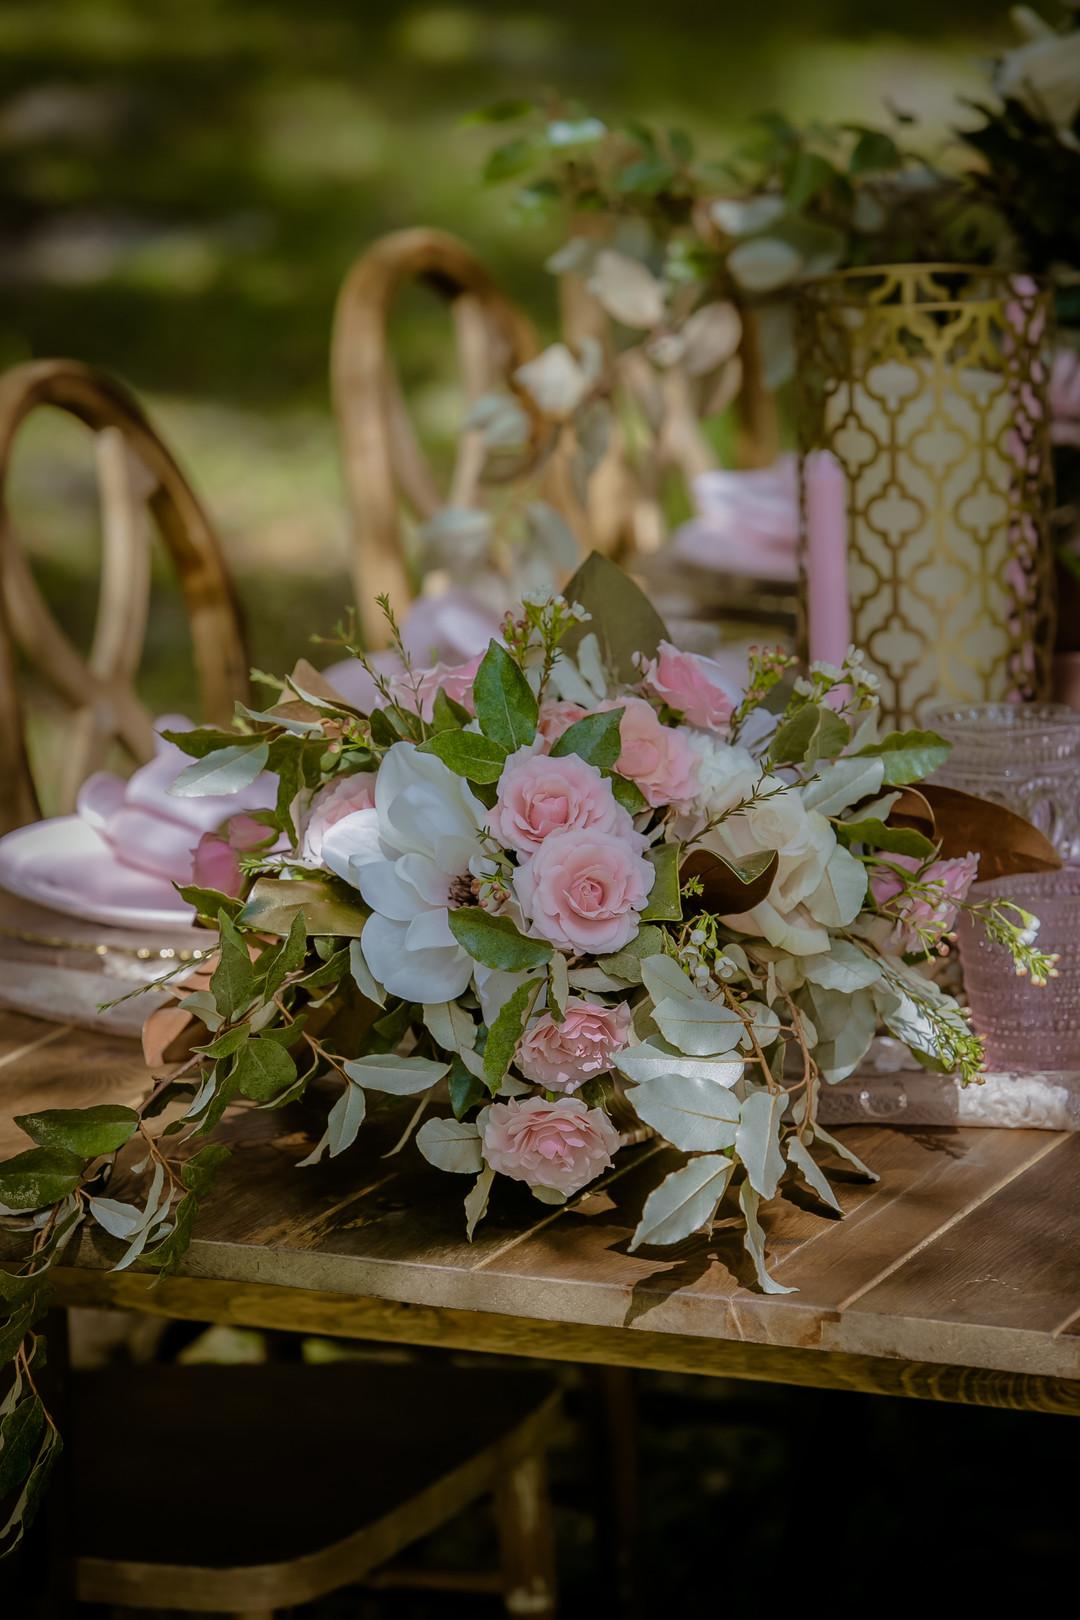 rose-hill-mansion-wedding-12.jpg